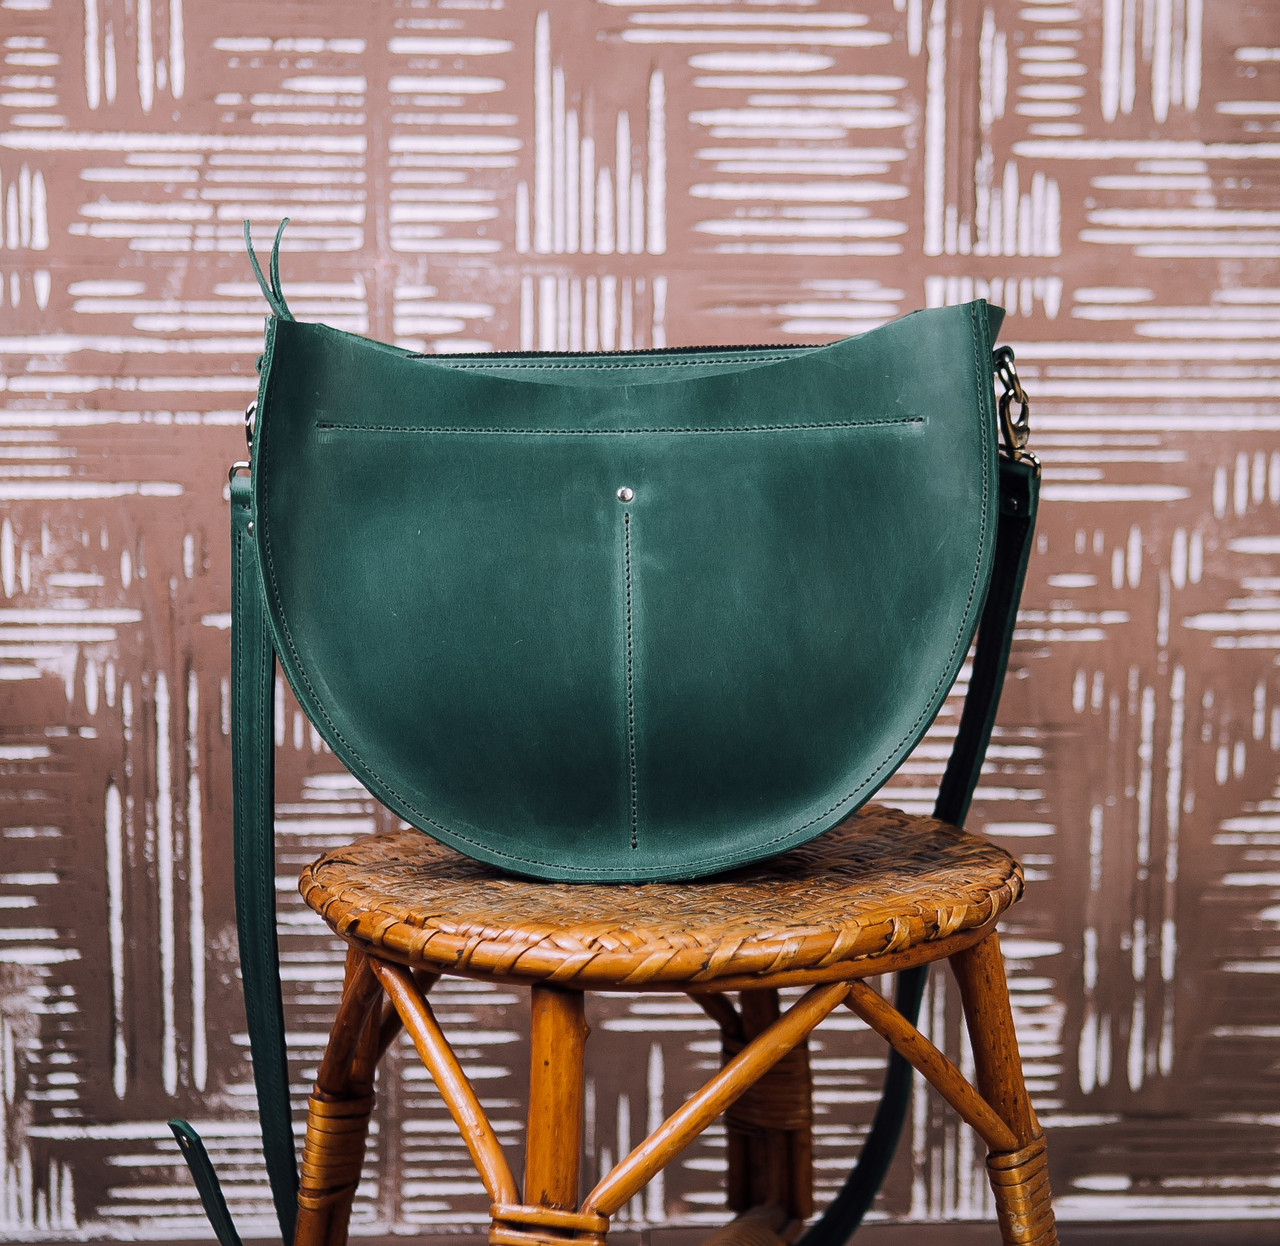 9c48e3eb0898 Кожаная сумка SEMI, цвет зеленый, кожа Кайзер, ручная работа, натуральная  кожа,